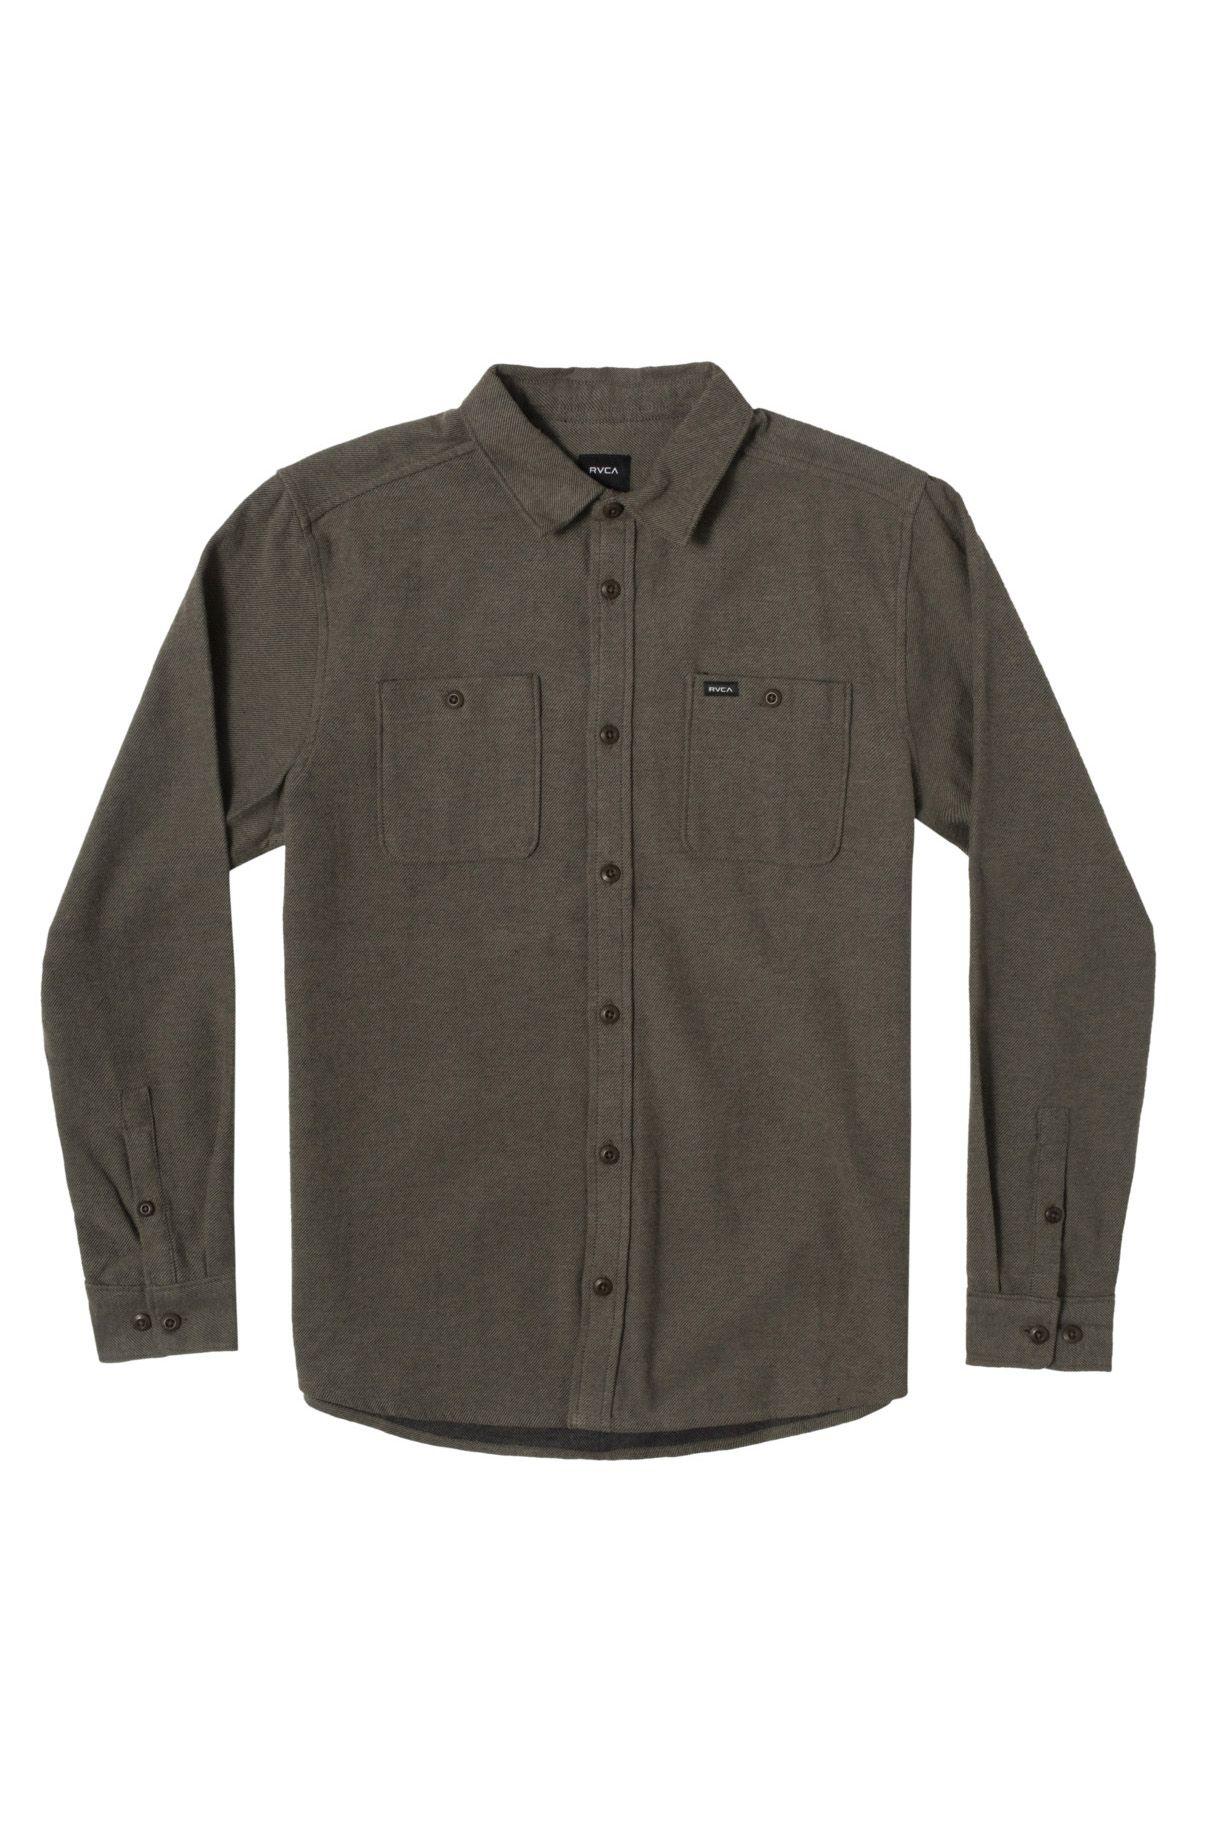 RVCA Shirt HARVEST FLANNEL LS Olive